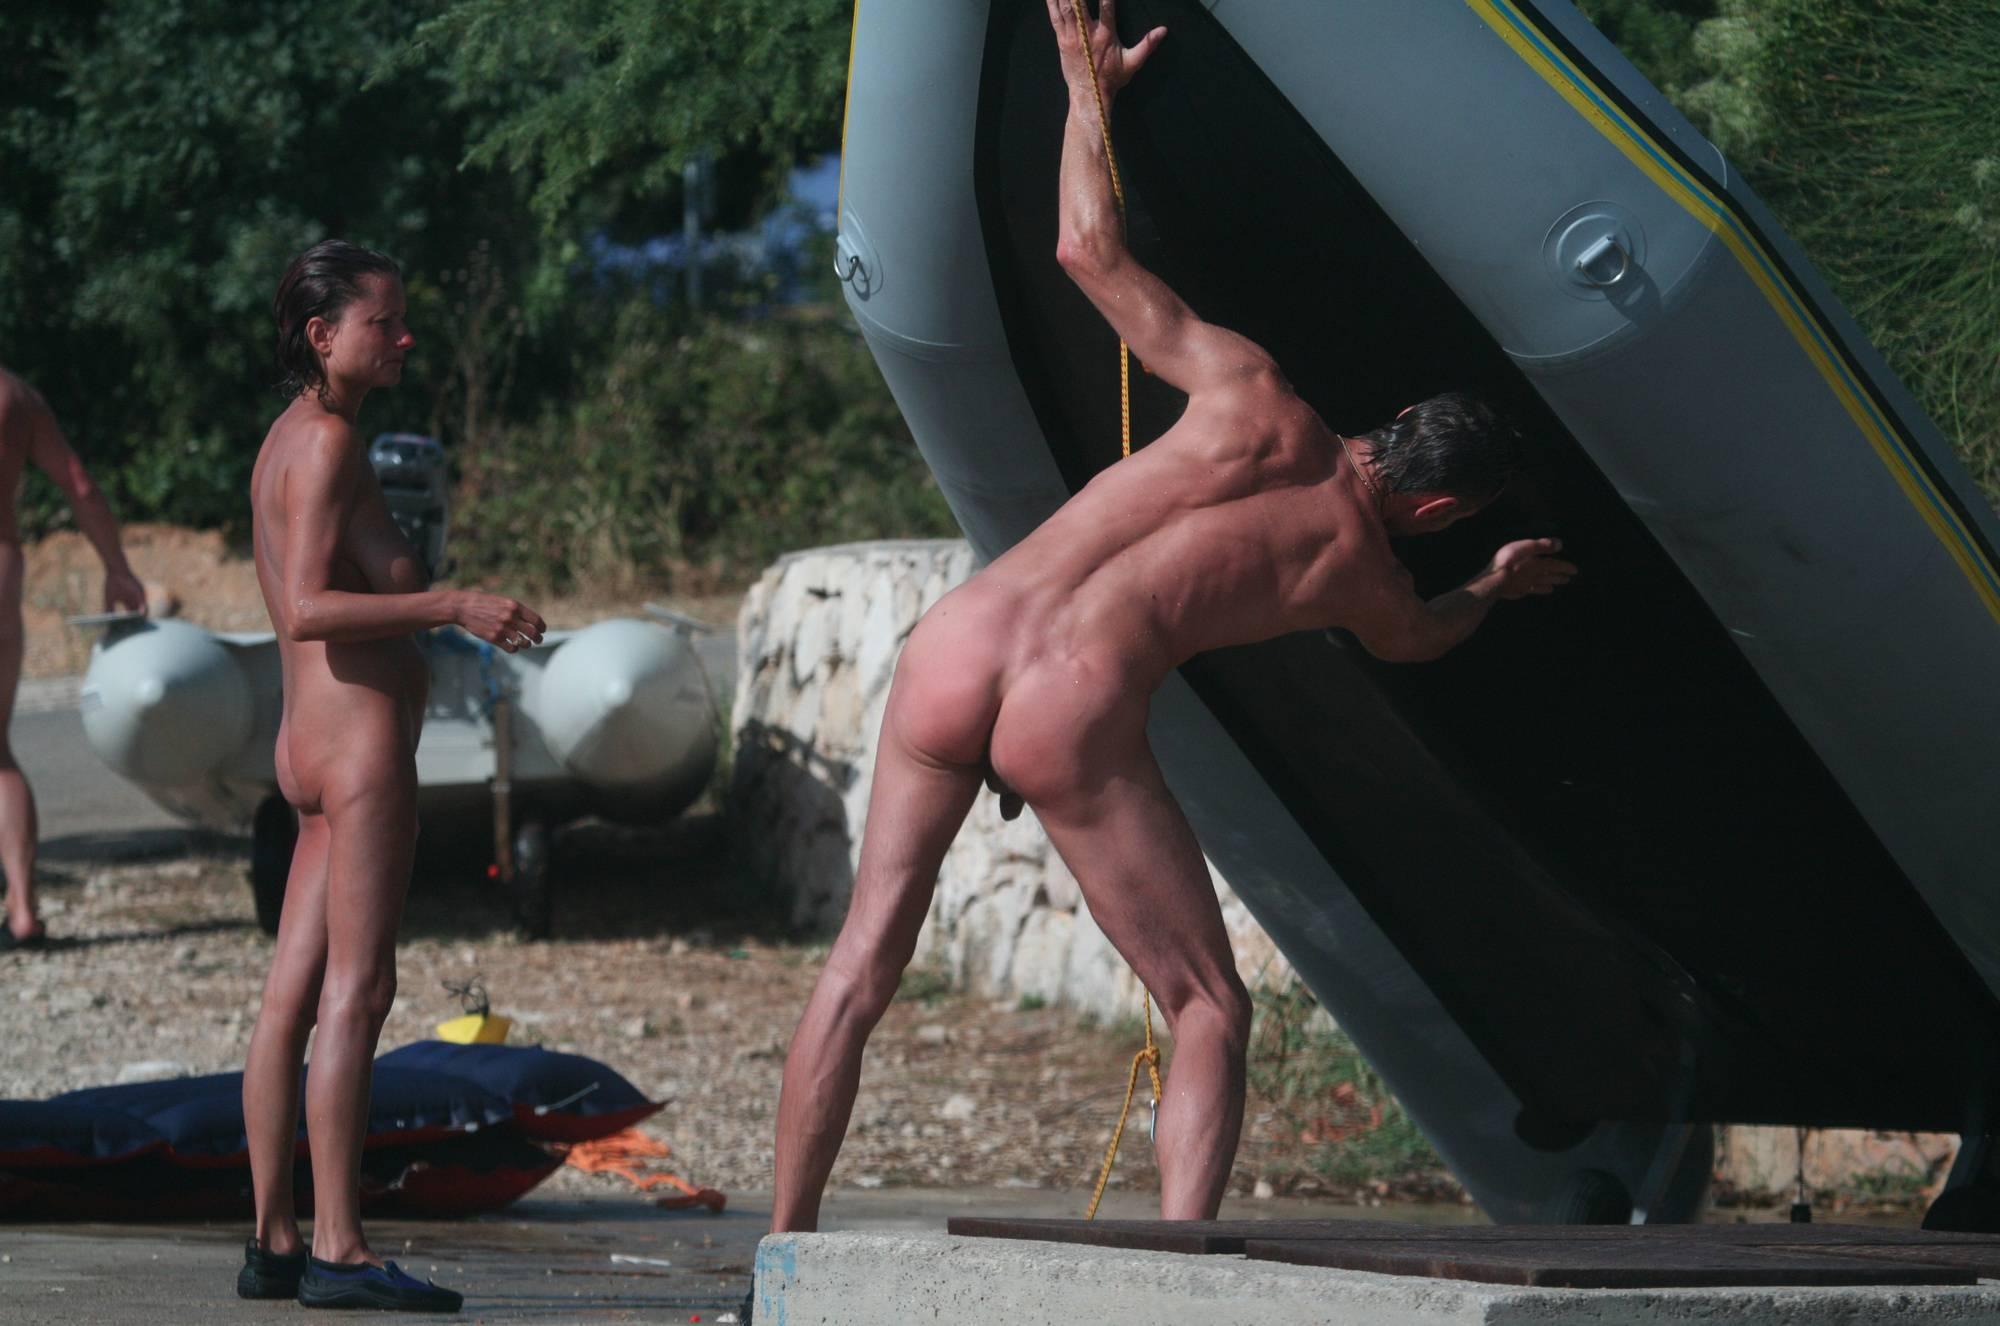 Nudist Photos Bares Boat Prepareation - 1